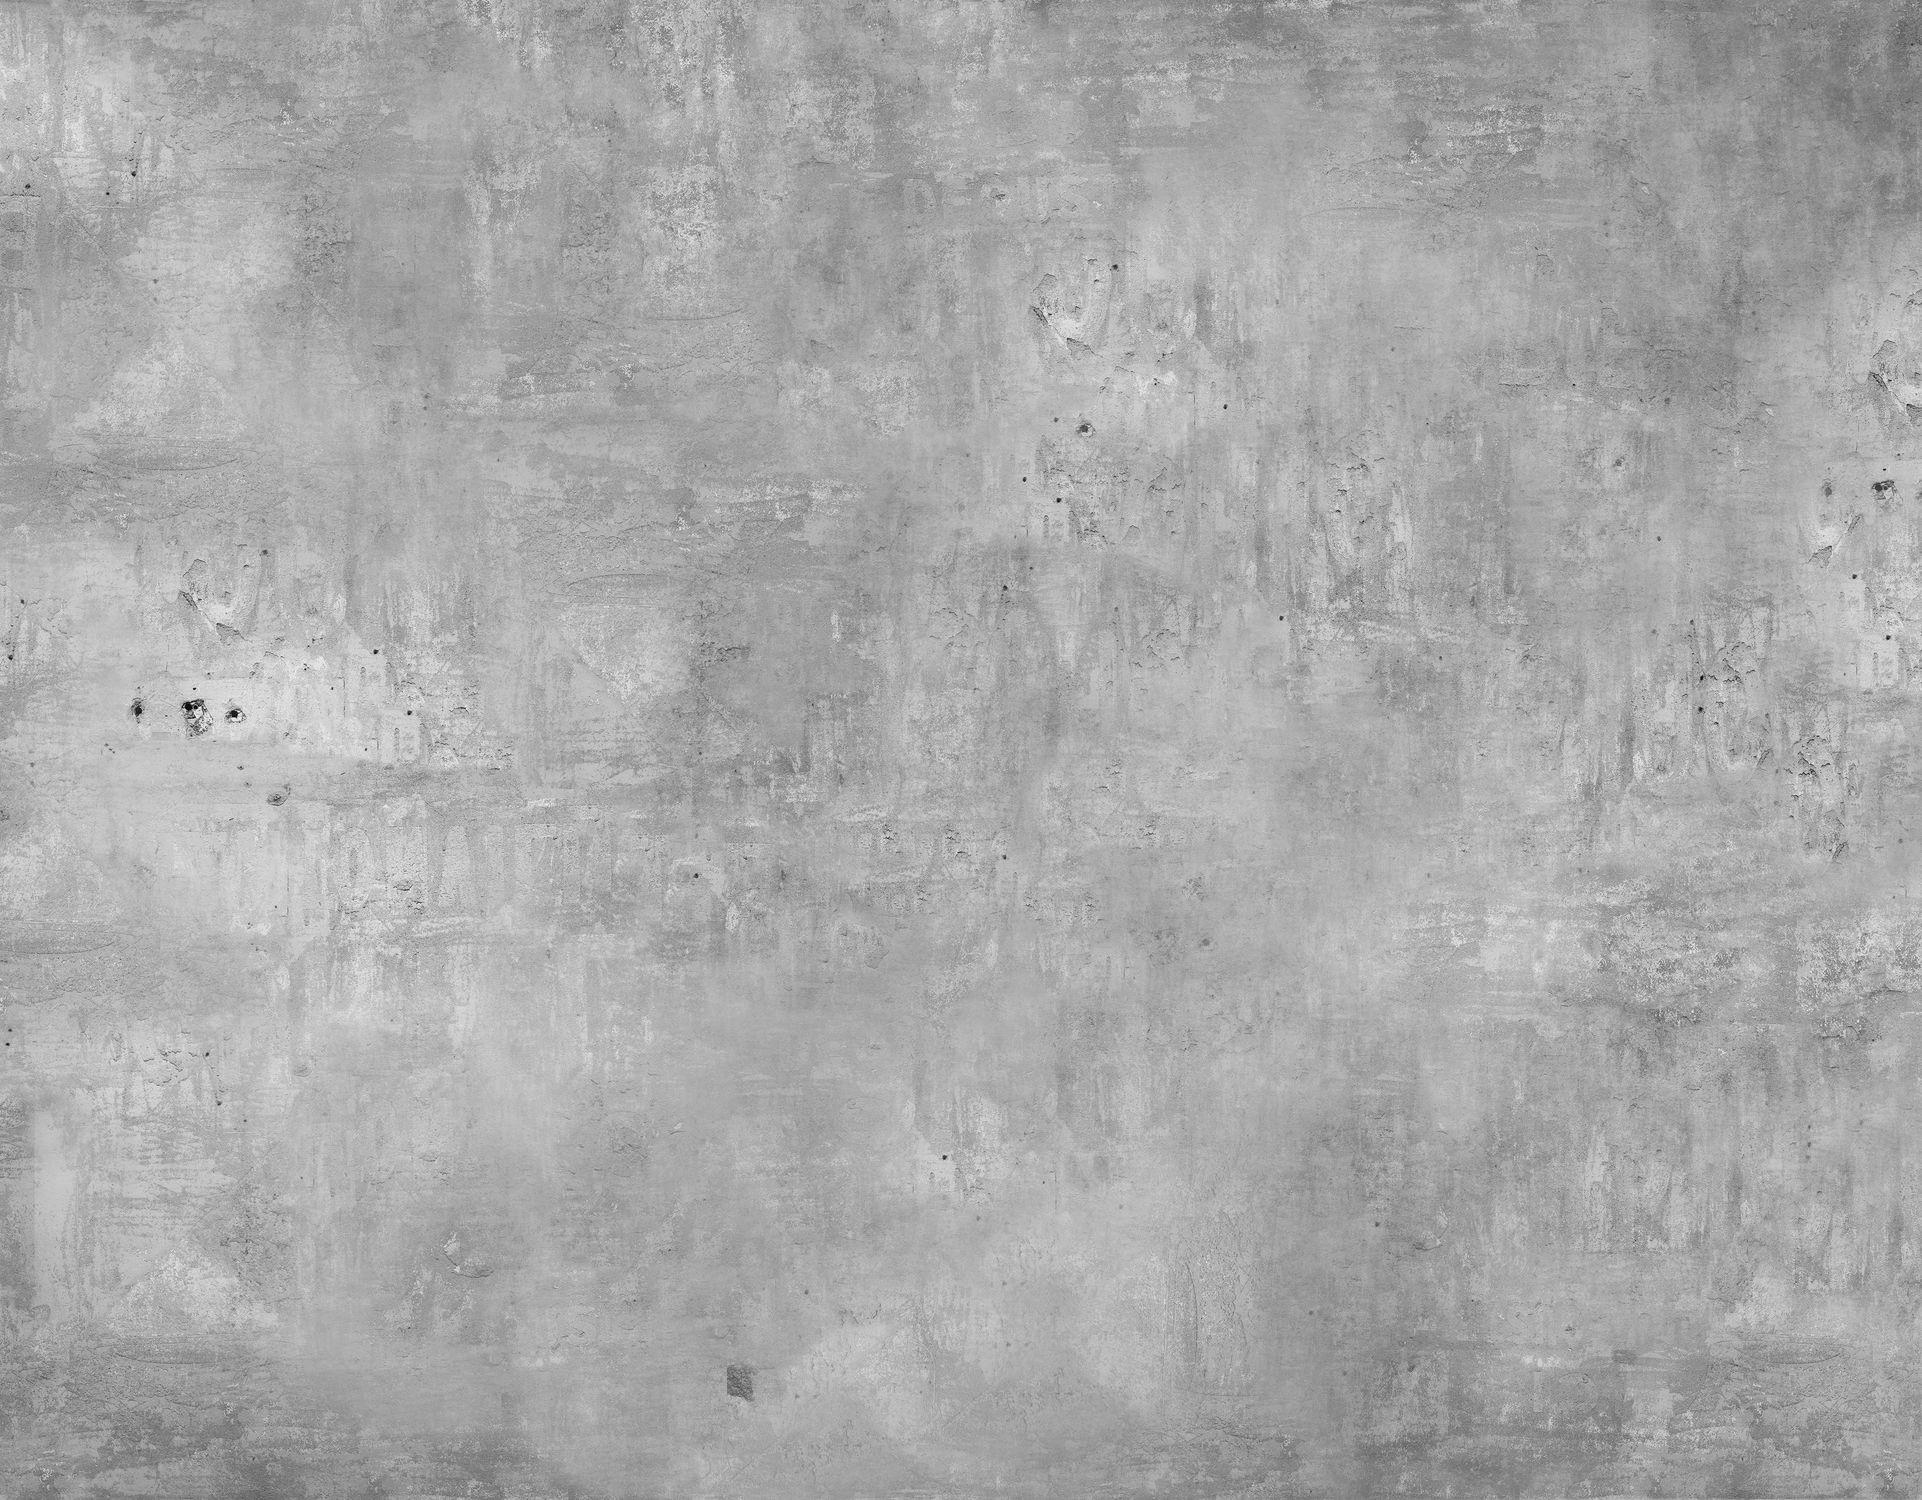 Concrete Wall Paper industrial style wallpaper / urban motif / non-woven / concrete